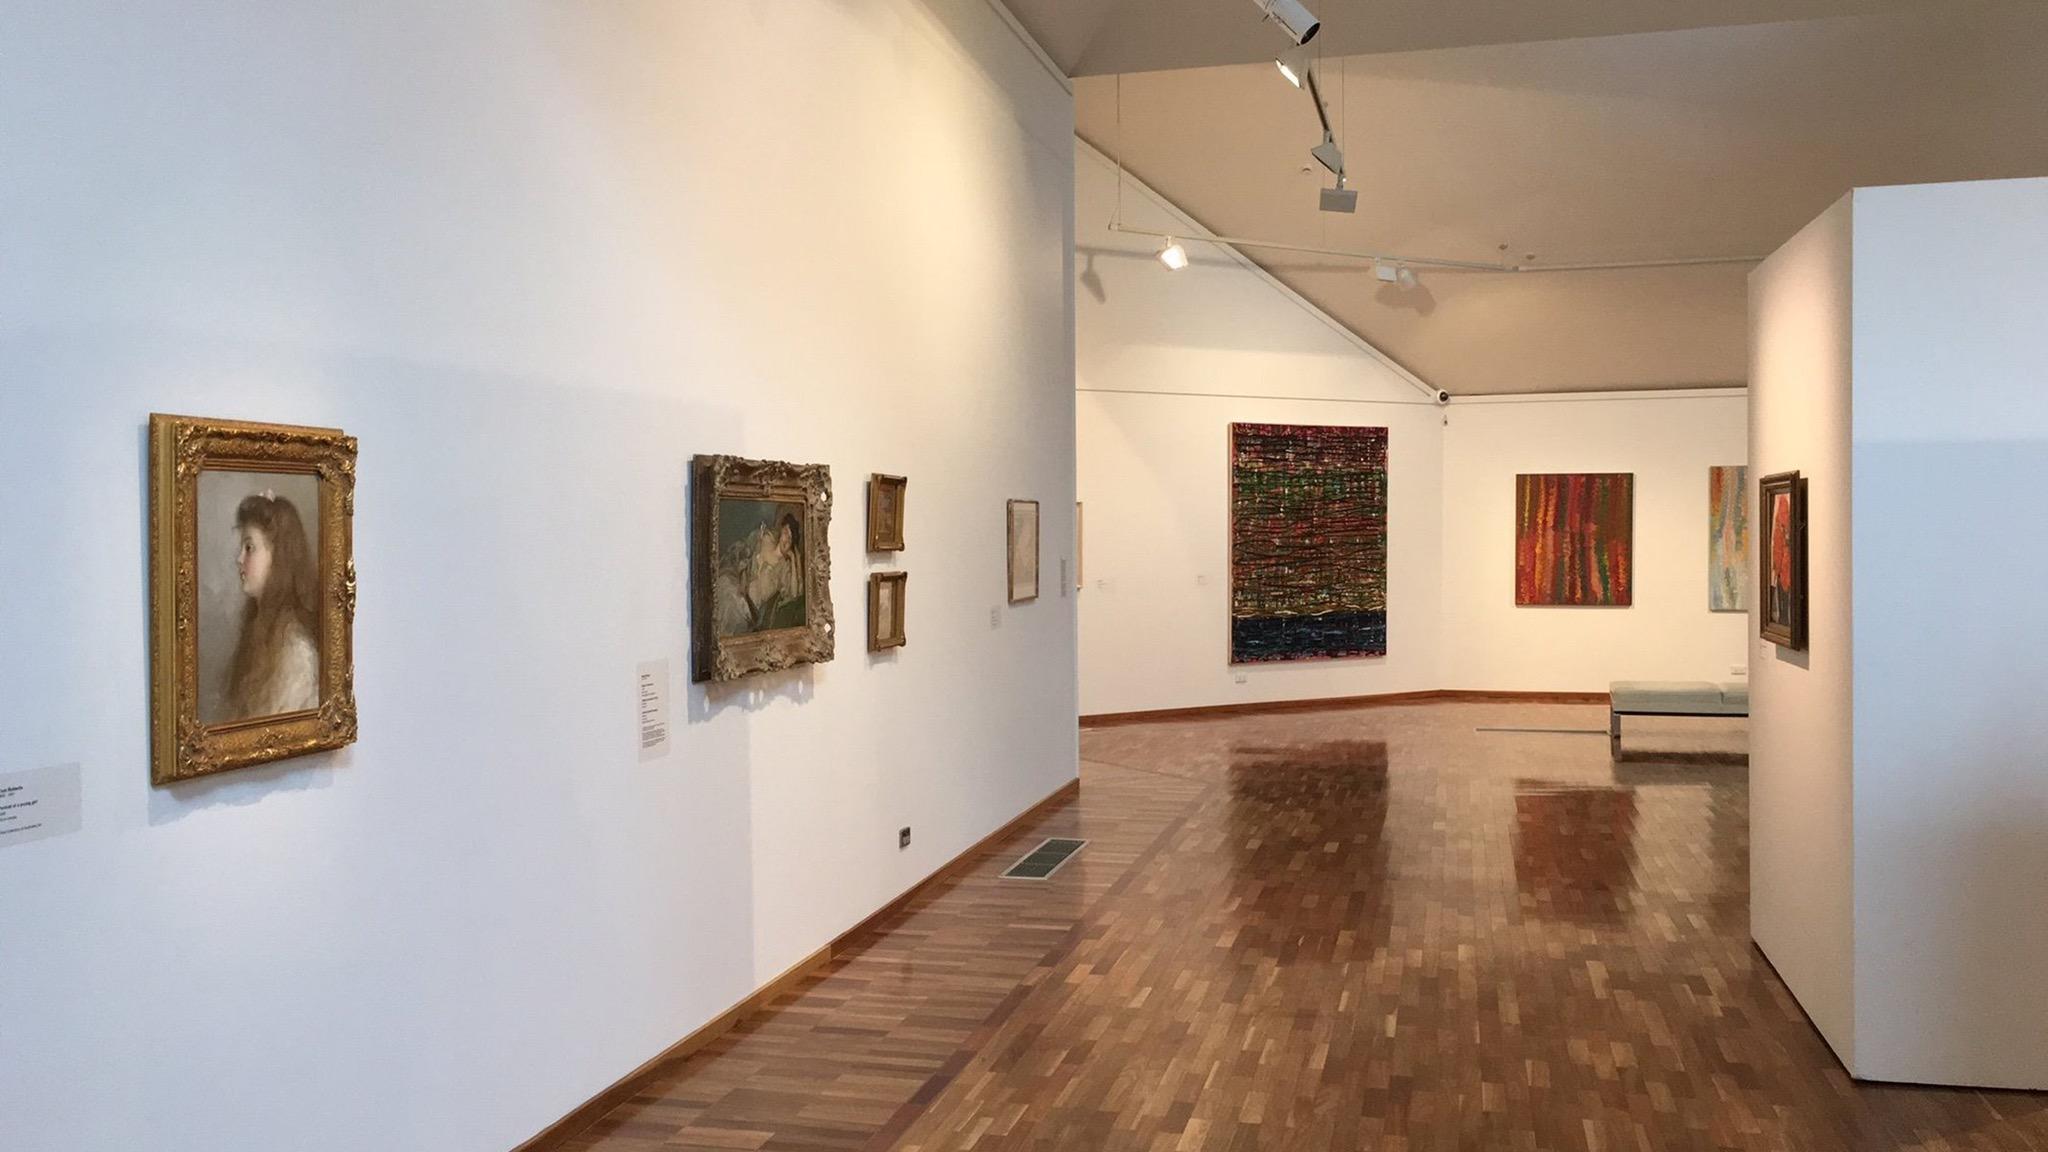 Benalla Art Gallery